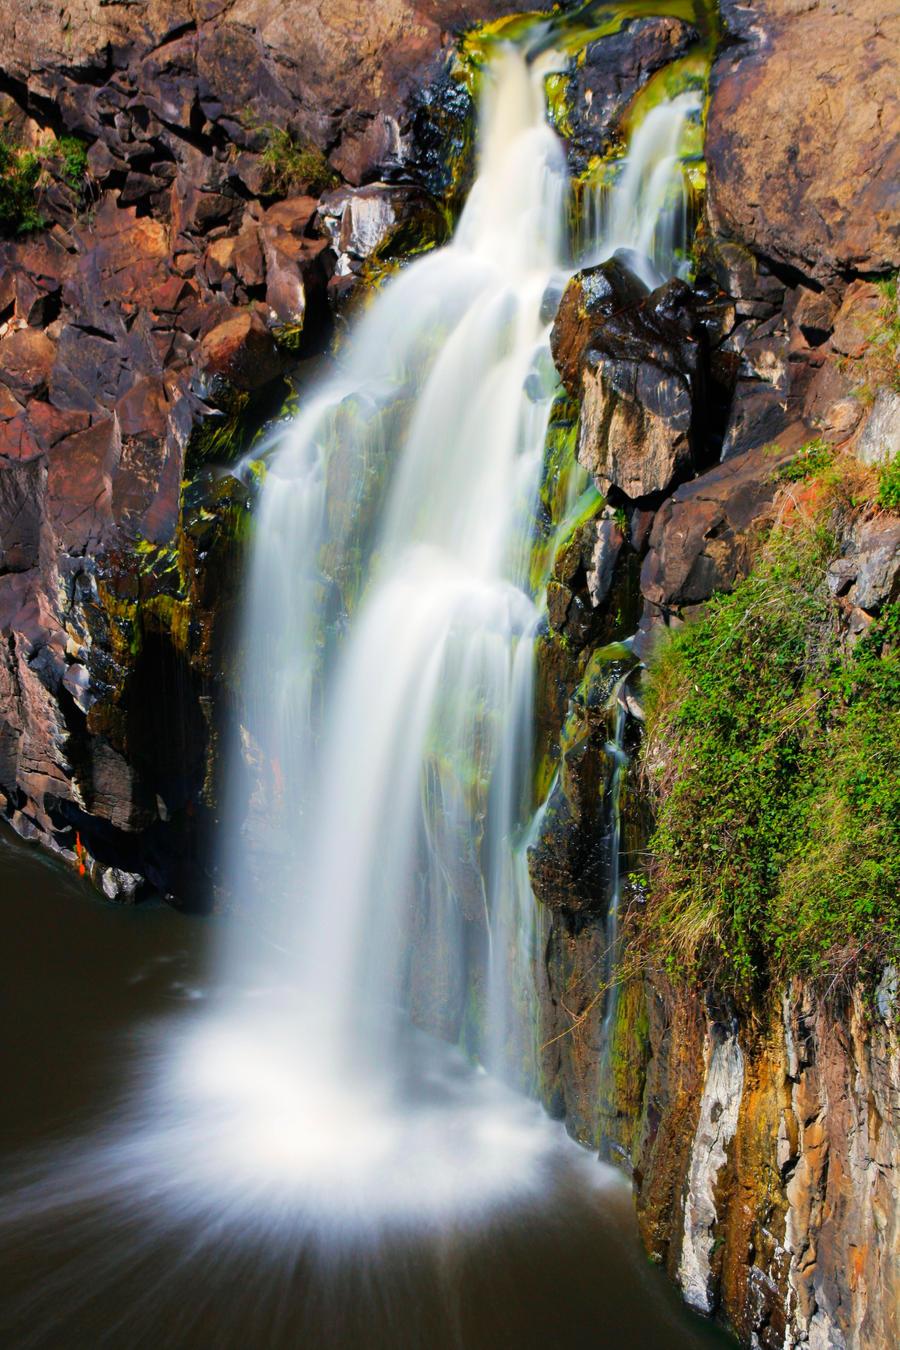 Turpin Falls 05 by Braunaudio